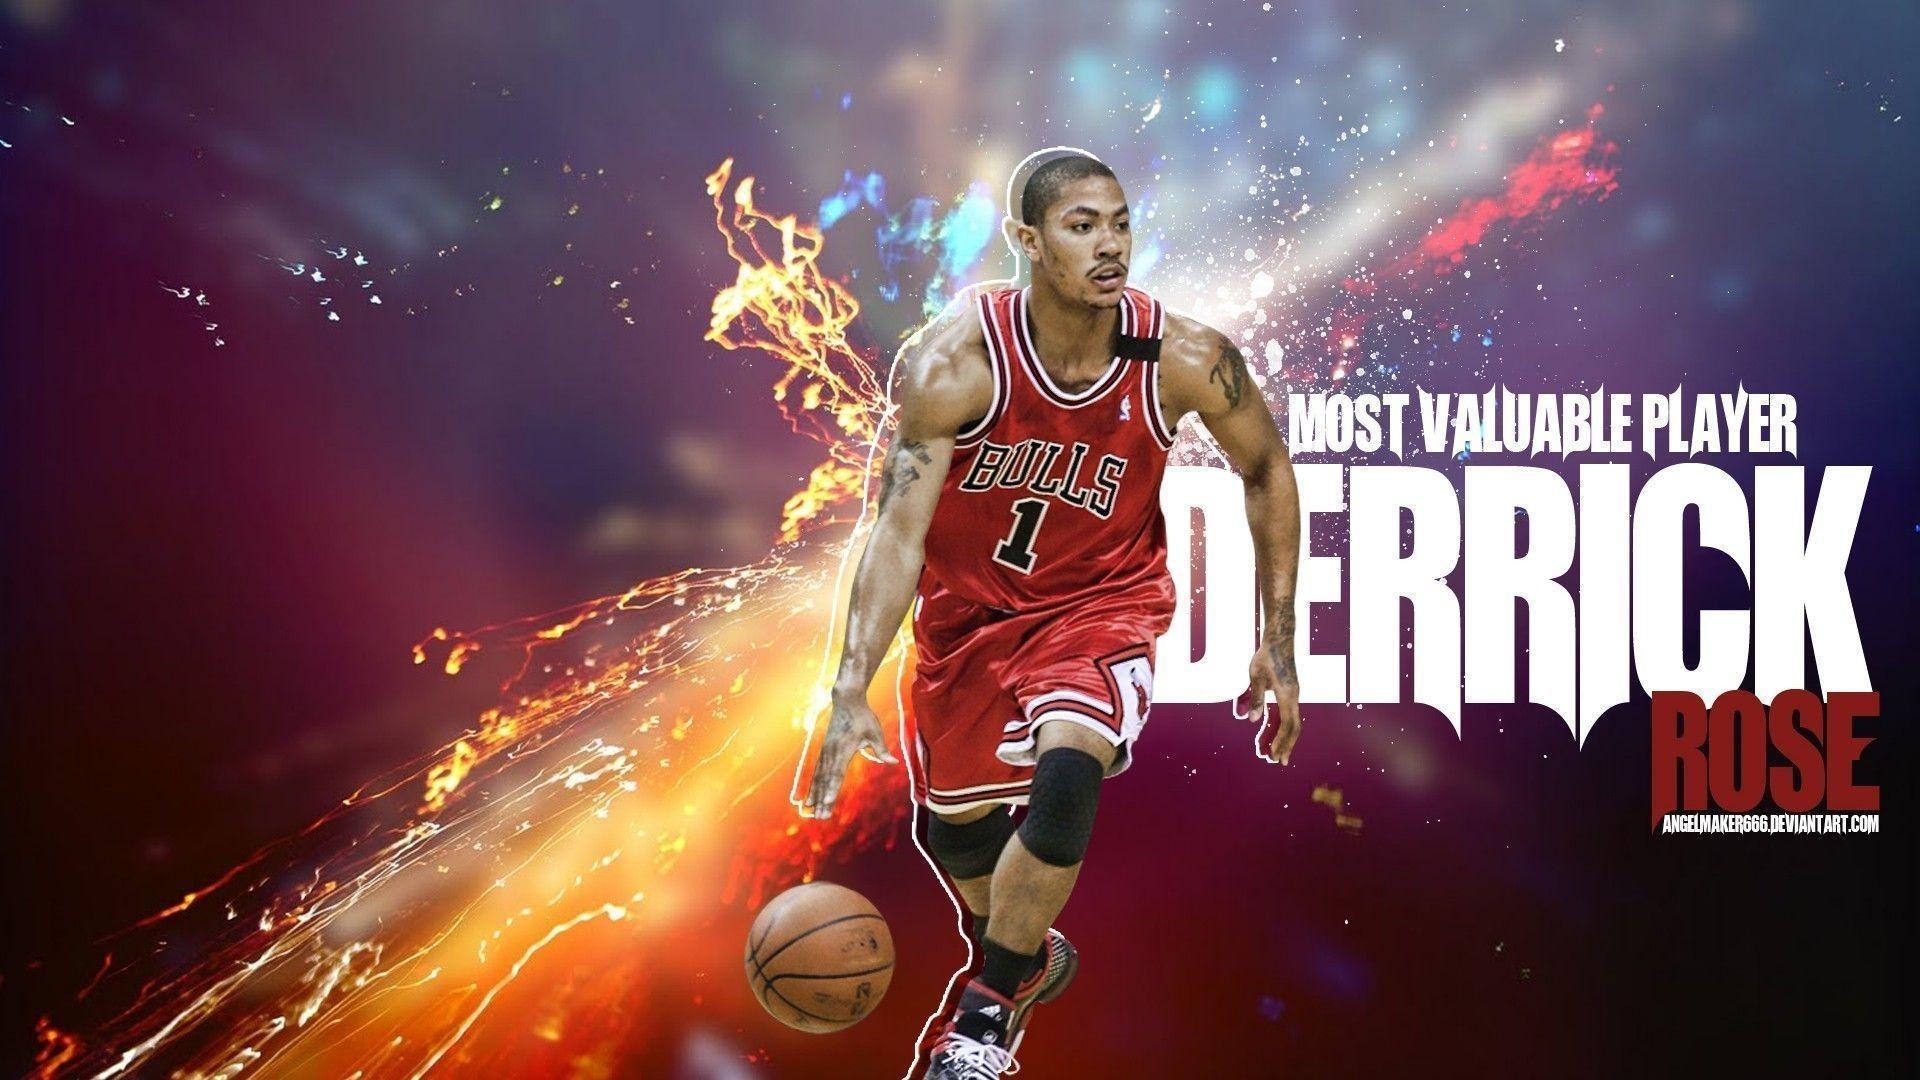 Derrick Rose Background